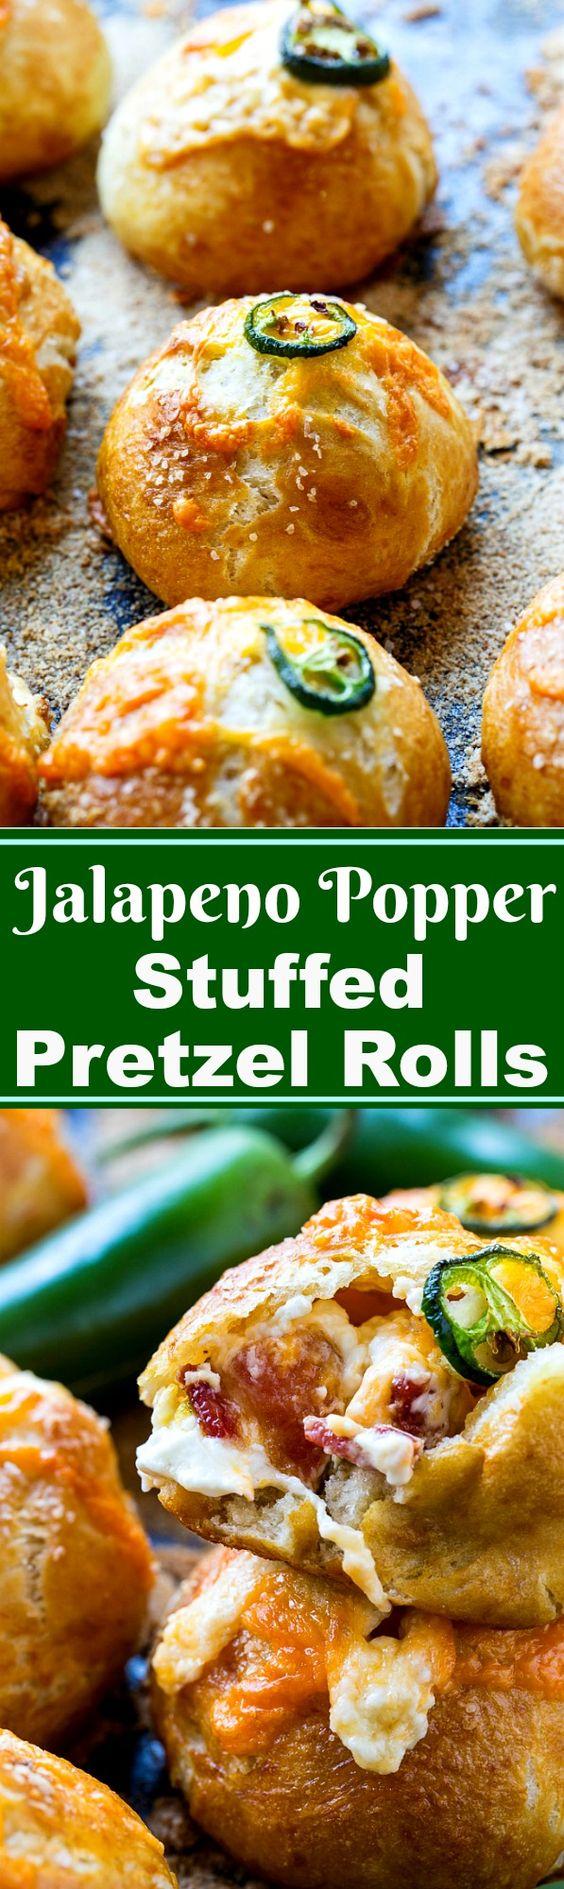 Jalapeno Popper Pretzel Rolls make a great game day food.: